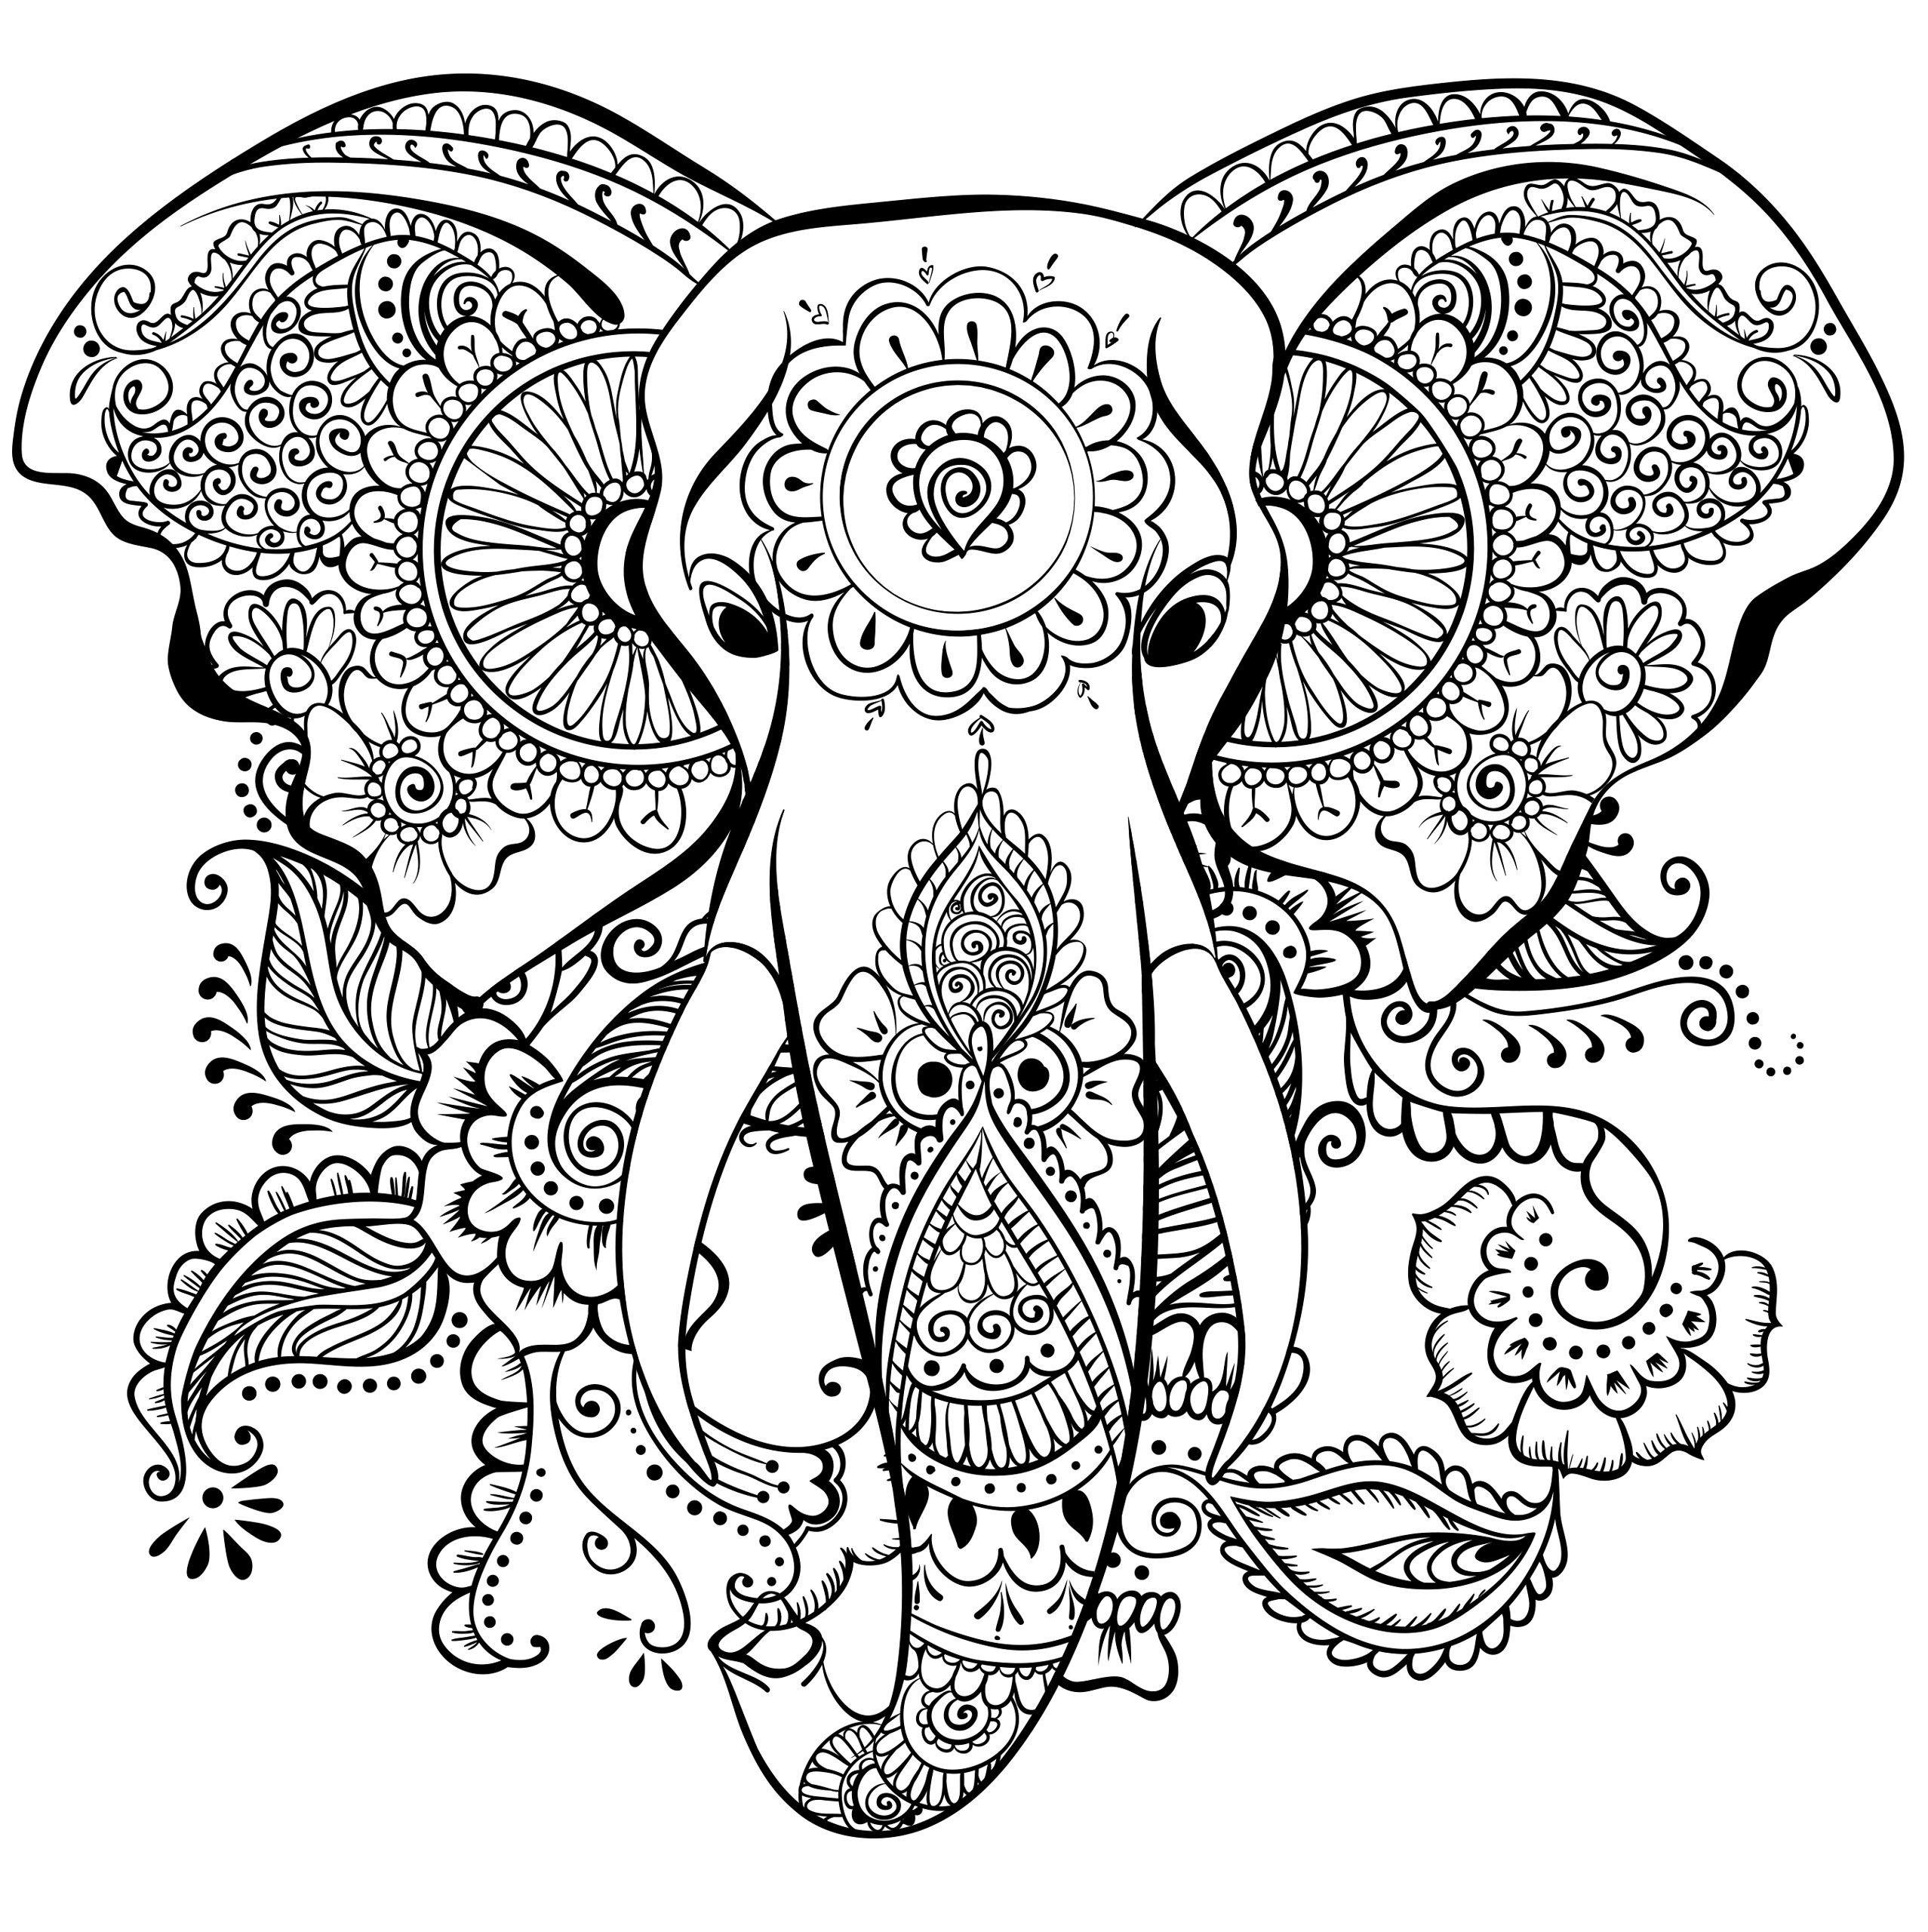 Elefant Ausmalbild Erwachsene Mandalas Pinterest